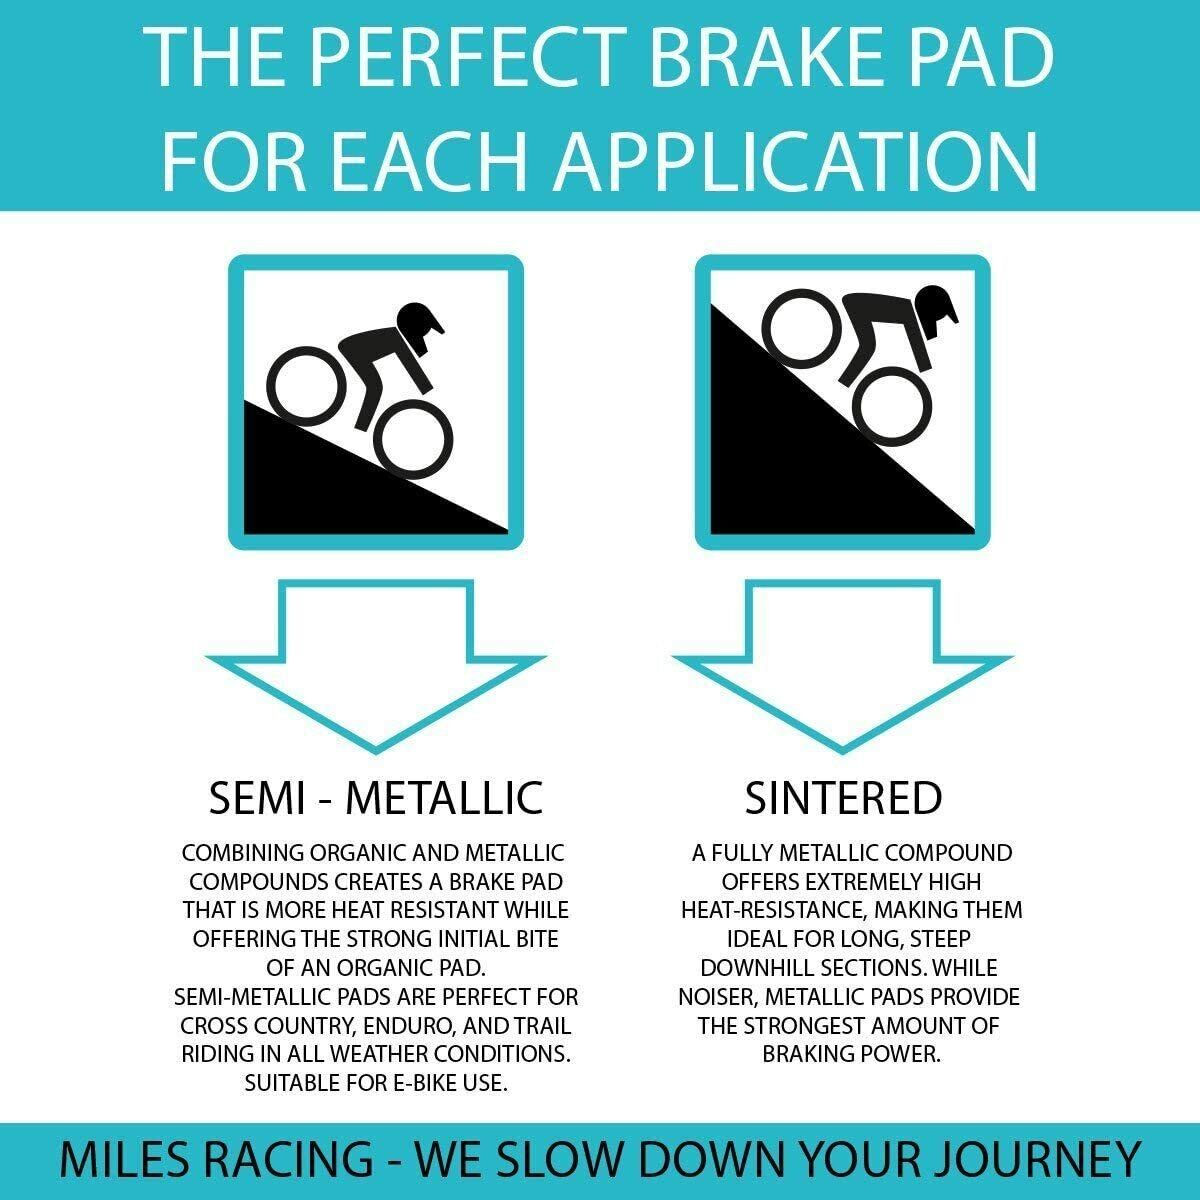 Miles Racing Sintered Brake Pads for Mountain Bike Disc Brakes Shimano New XTR